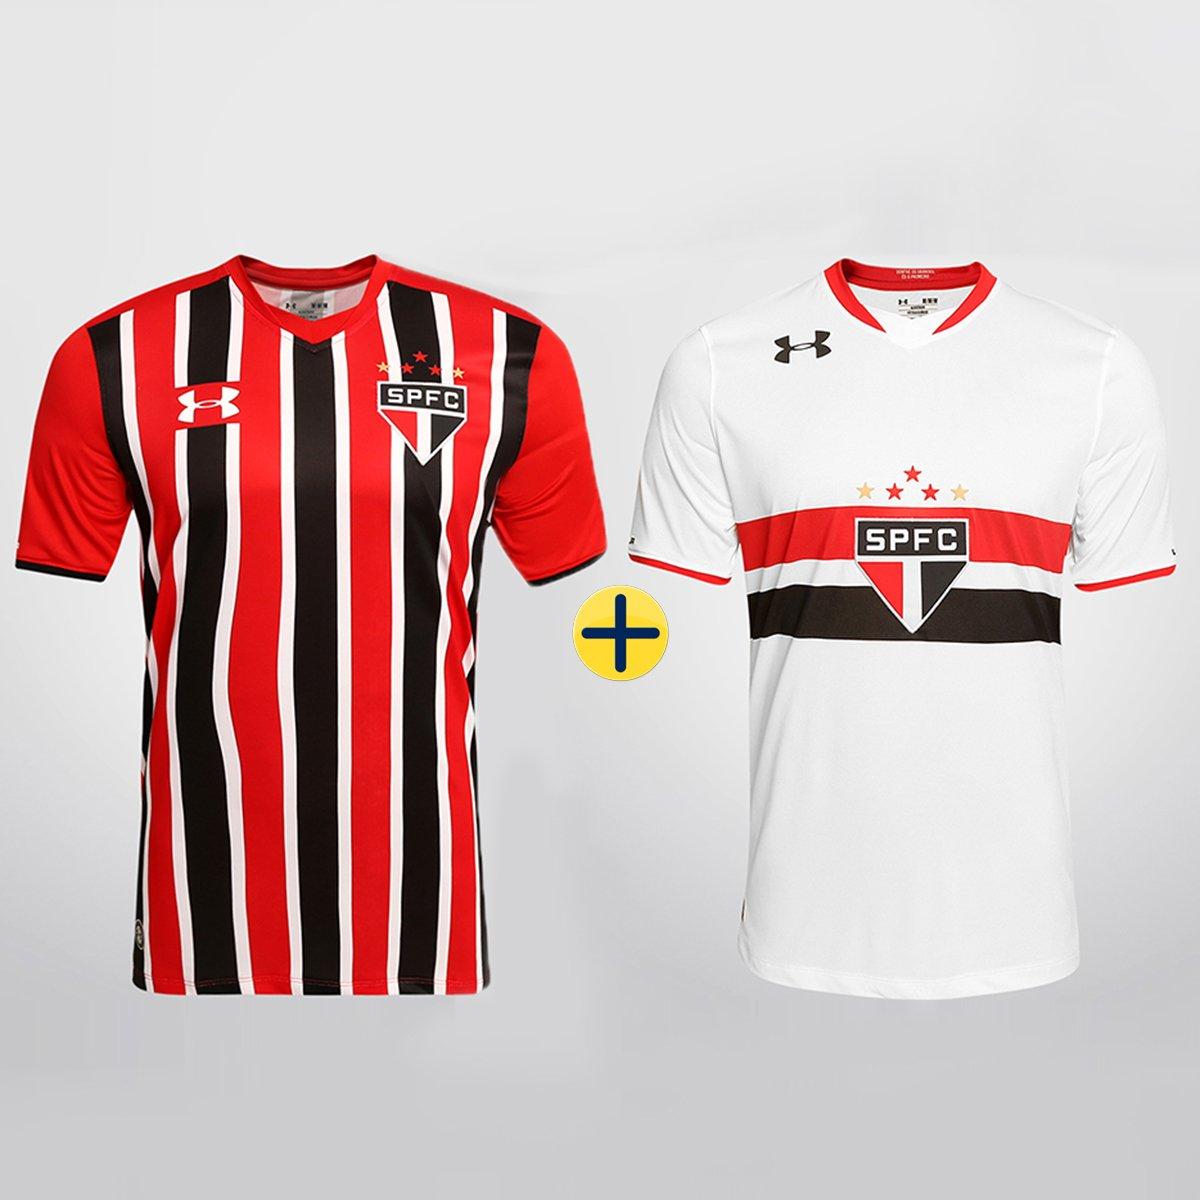 8e7a9dacc59 Kit Under Armour São Paulo - Camisa I 2015 s nº + Camisa II 2015 s nº -  Compre Agora